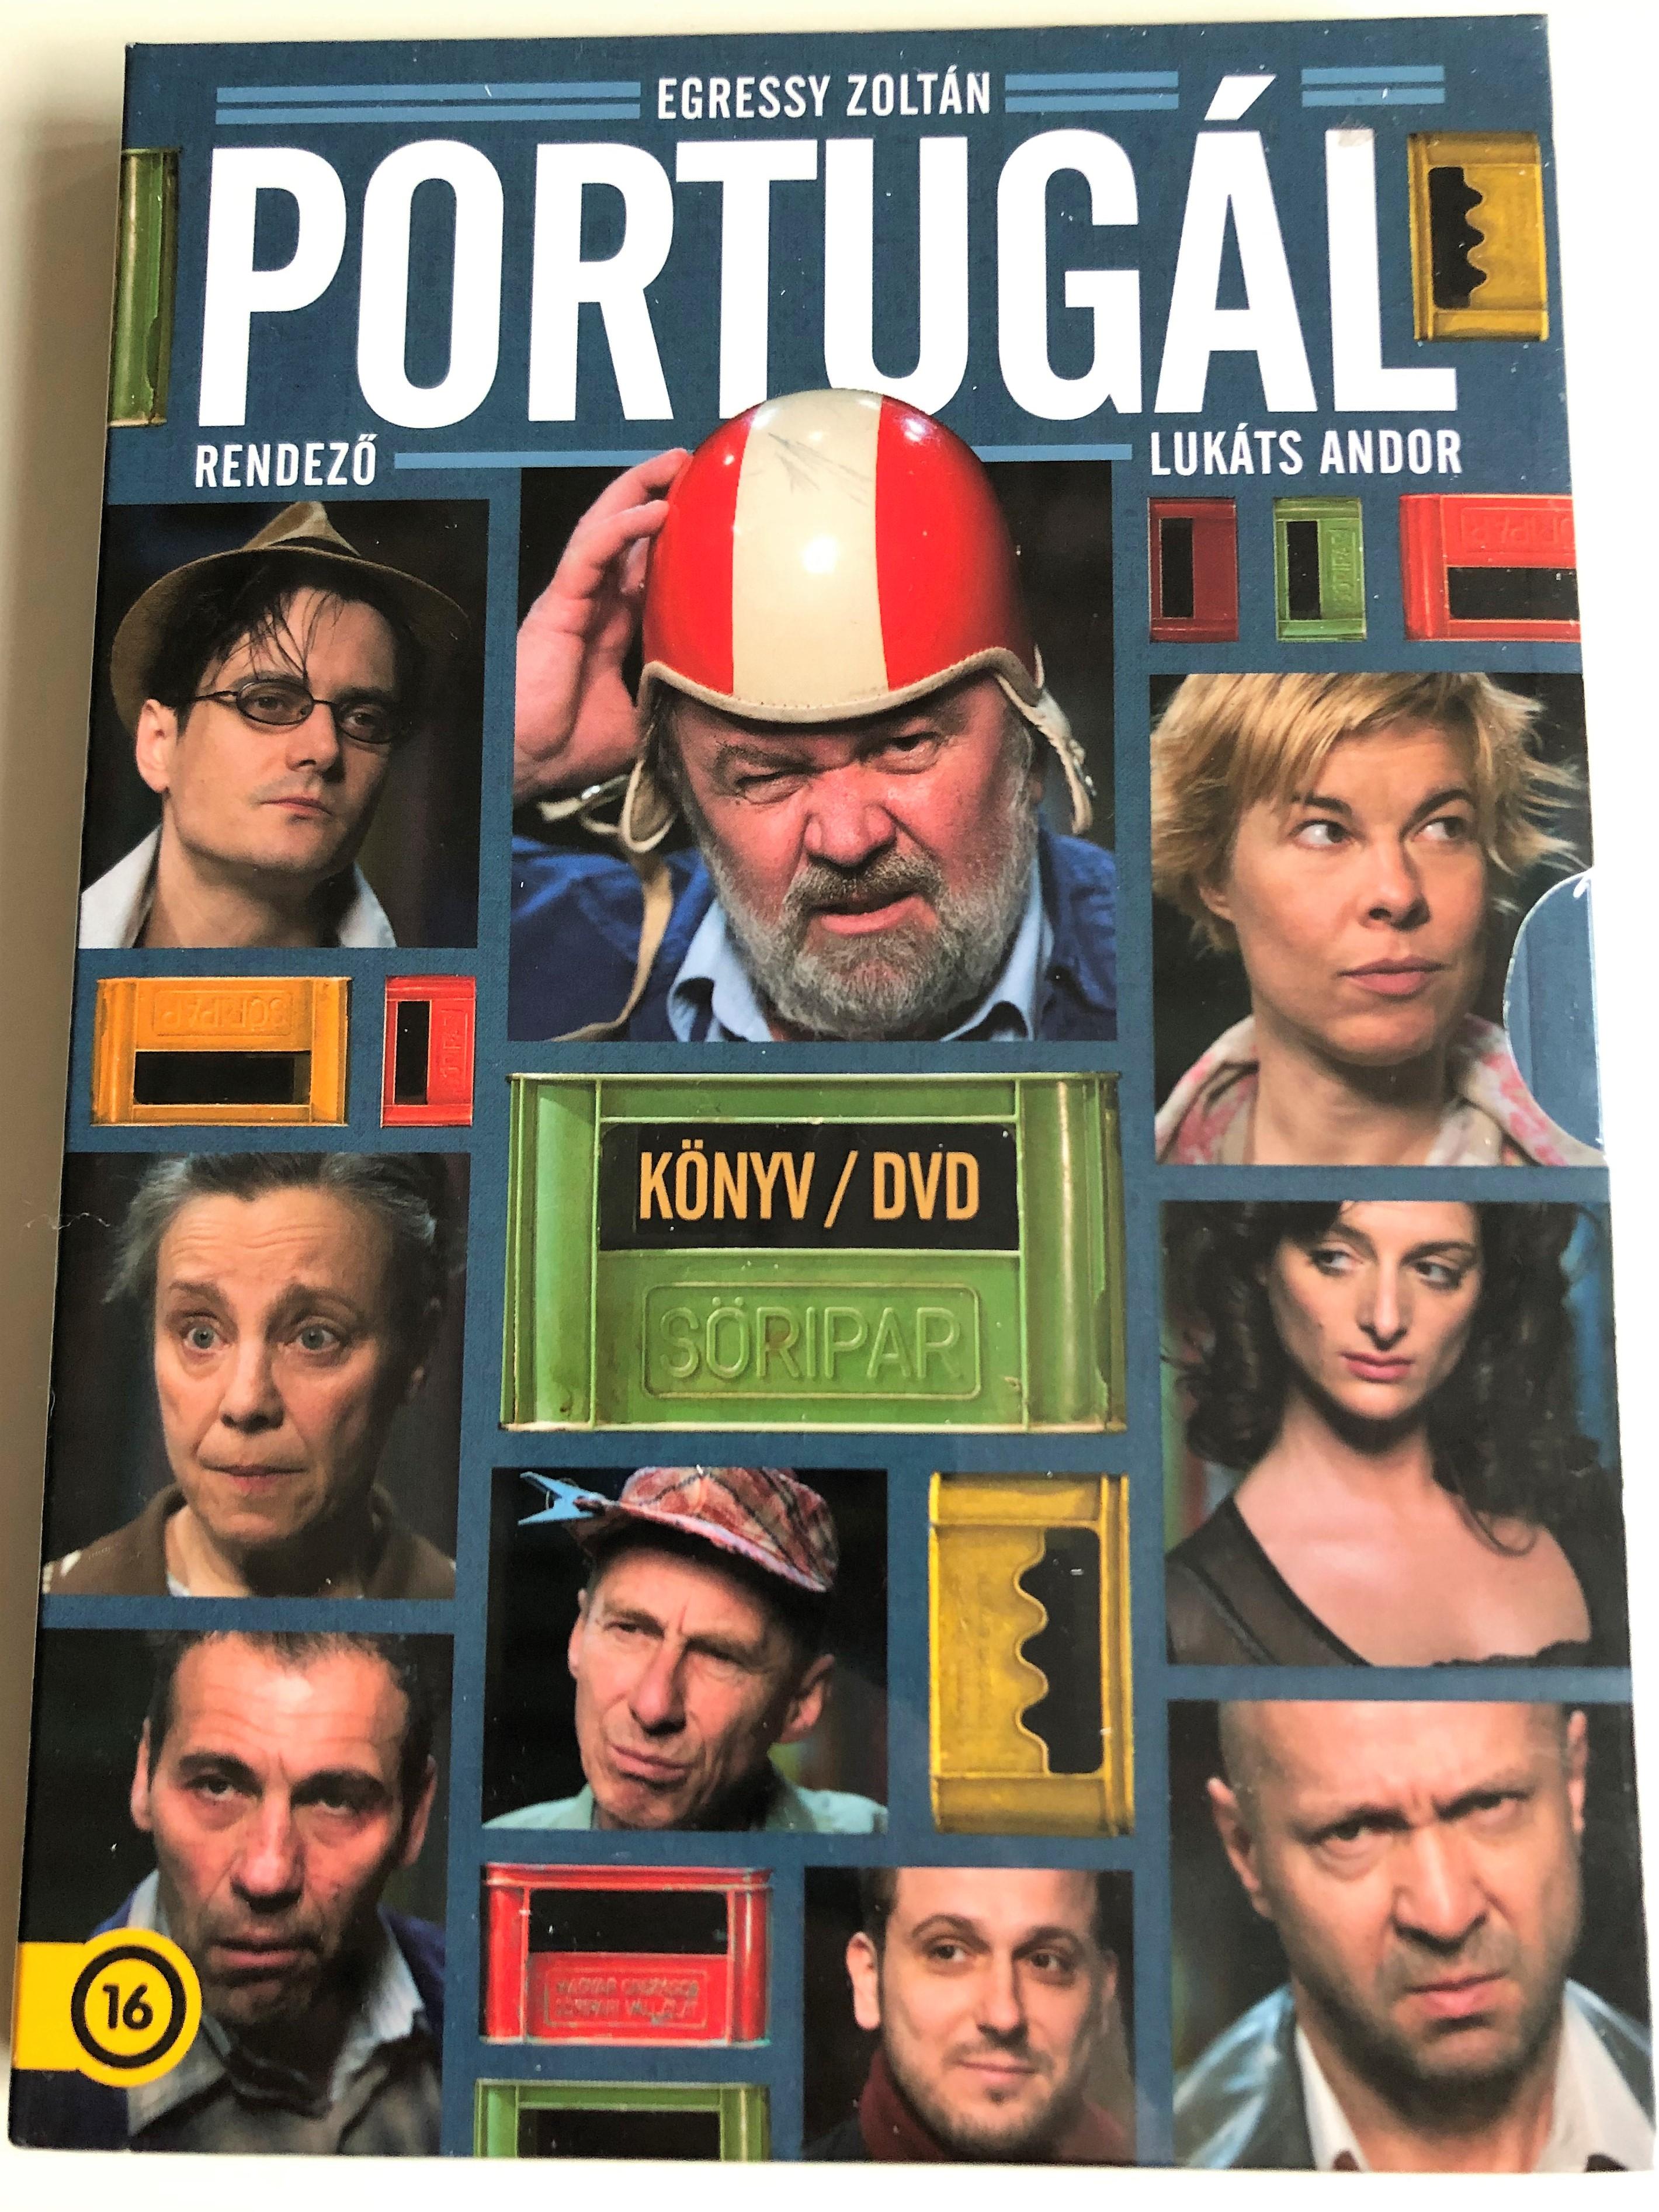 egressy-zolt-n-portug-l-dvd-2014-directed-by-luk-ts-andor-starring-csuja-imre-pels-czy-r-ka-b-n-j-nos-szirtes-gi-varga-zolt-n-lengyel-ferenc-m-sz-ros-b-la-keresztes-tam-s-theatre-play-book-and-dvd-katona-j-1-.jpg